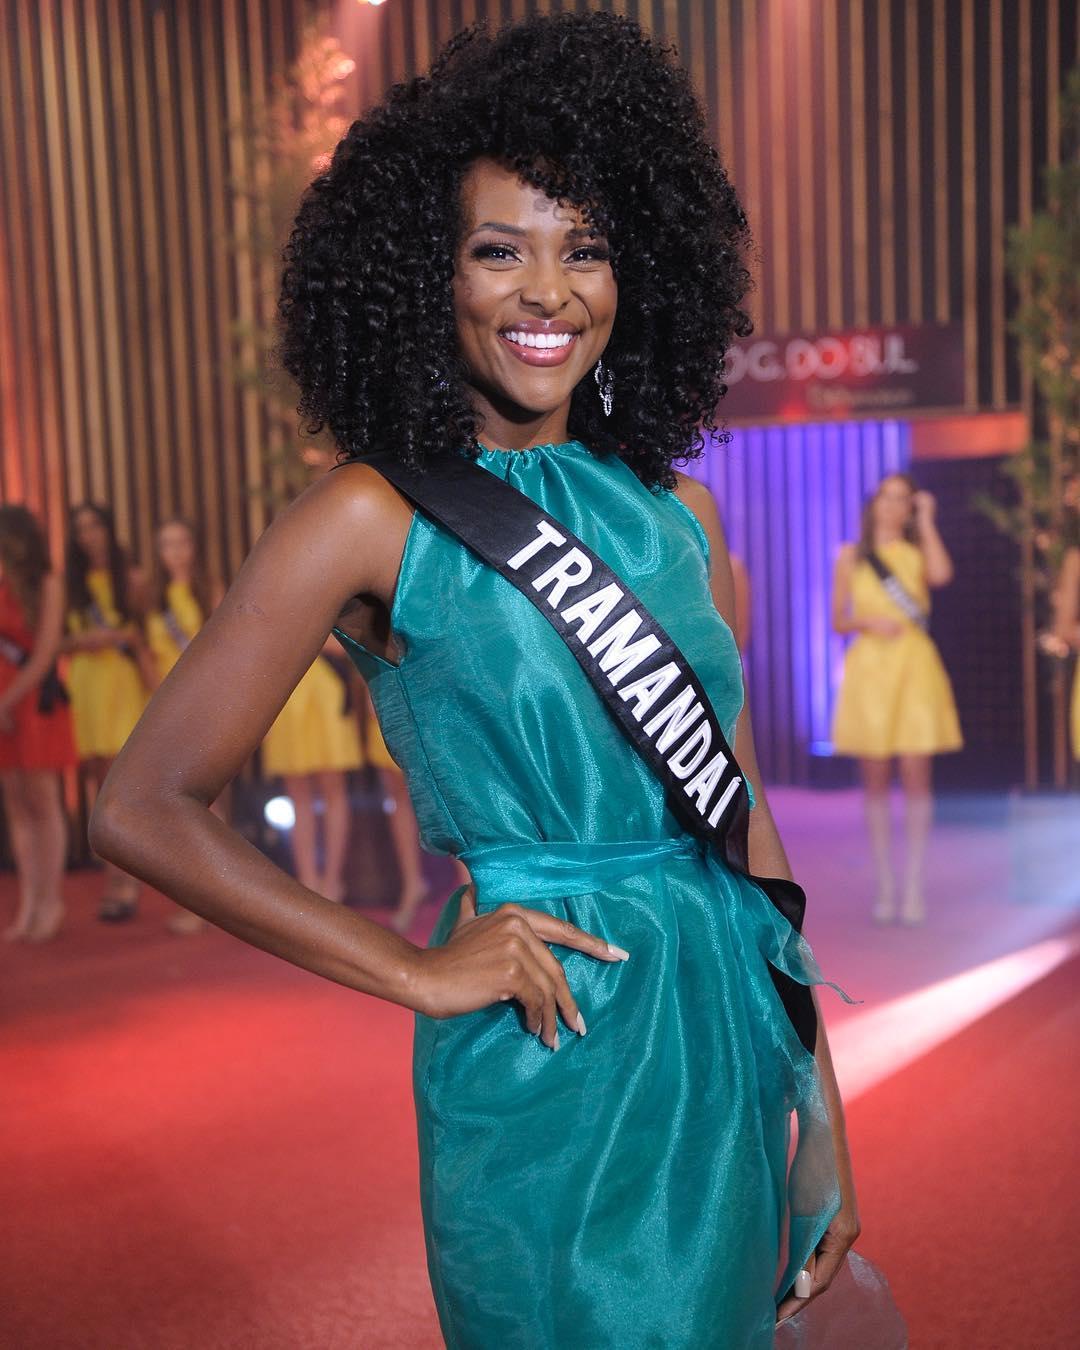 samen dos santos, top 4 de miss brasil mundo 2016, miss brasil global city 2016. - Página 5 30590811